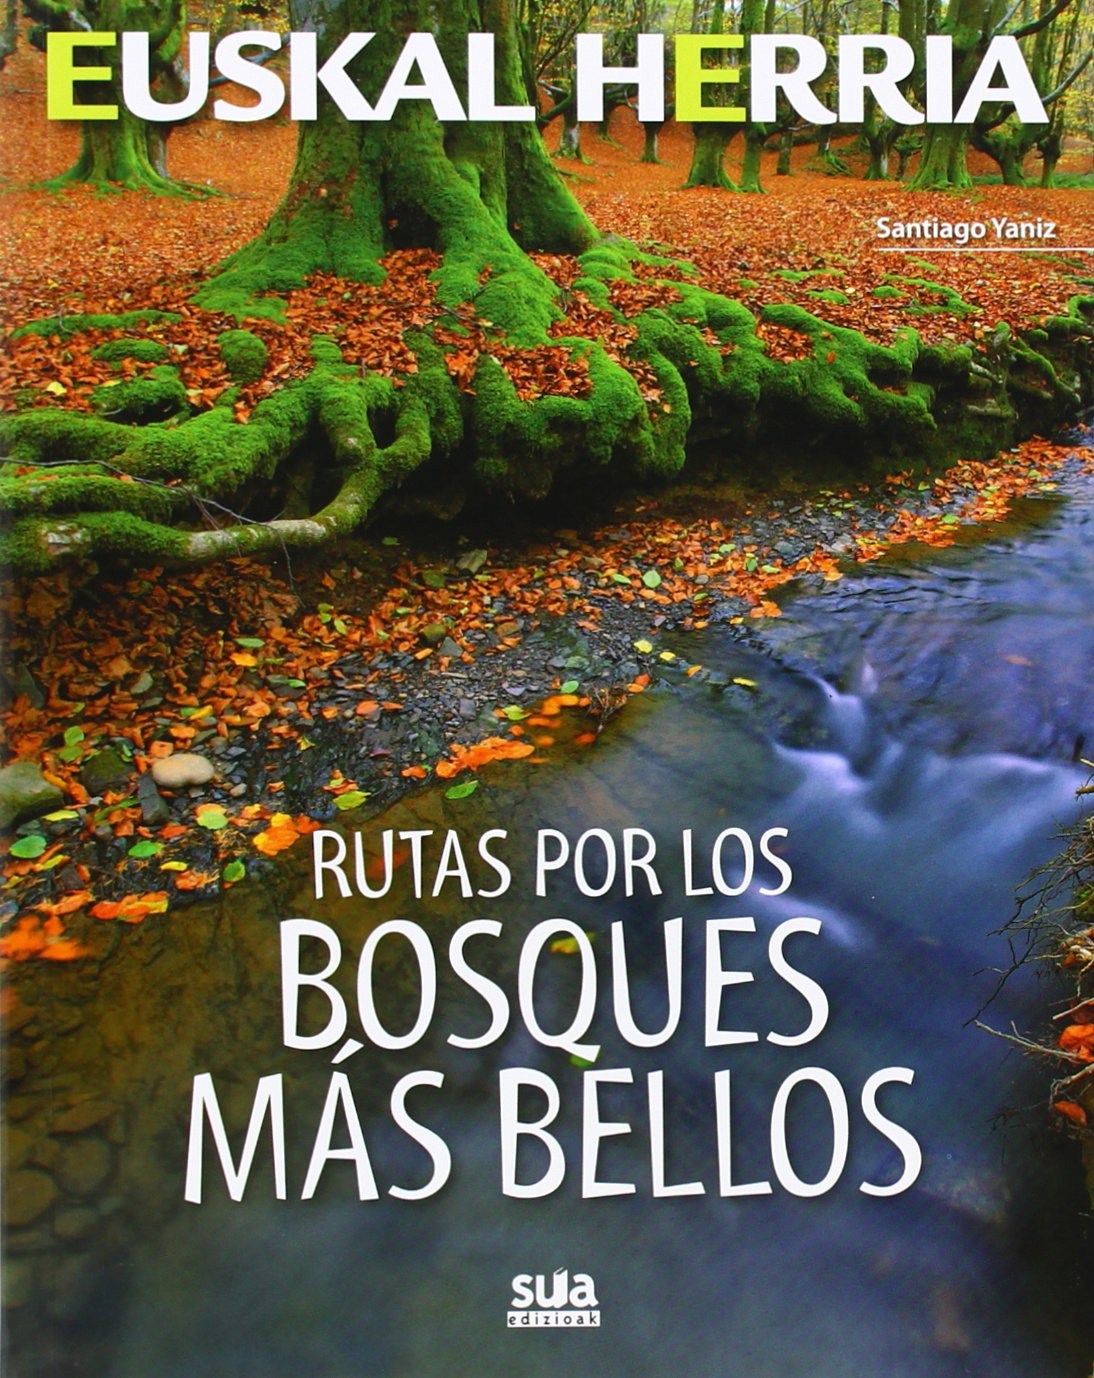 Rutas por los bosques mas bellos (Euskal Herria) Tapa blanda – 25 abr 2014 Santiago Yaniz Aramendia SUA 8482165399 Guías de ecoturismo